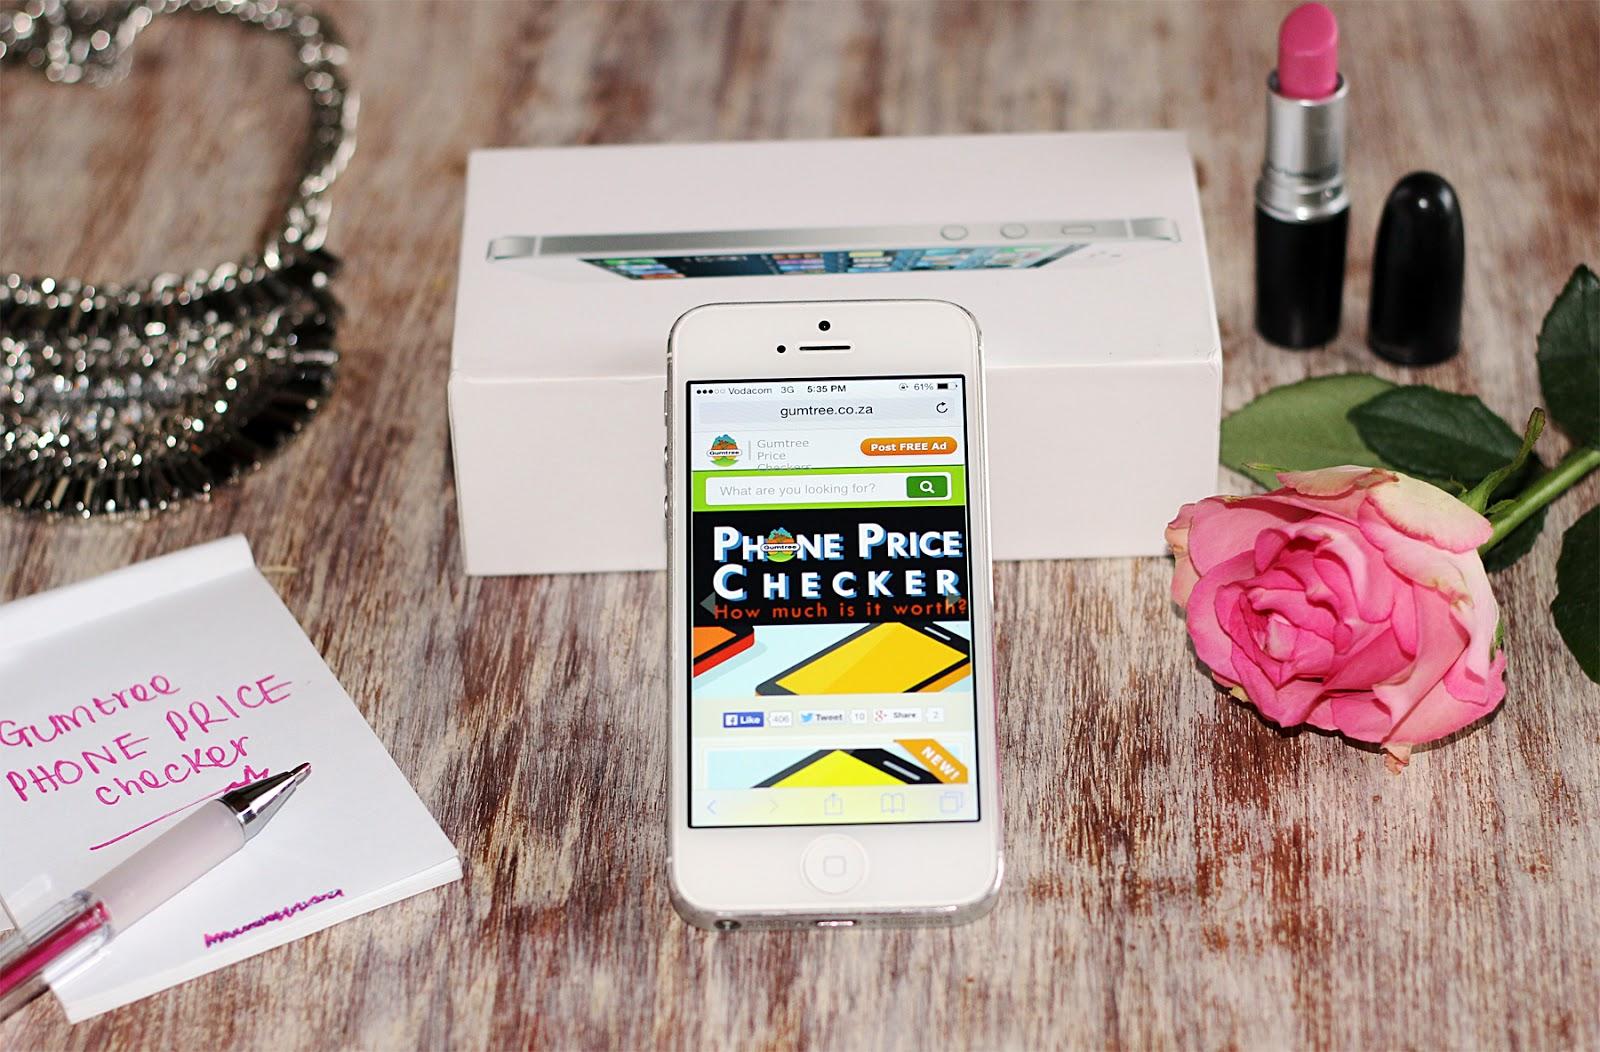 gumtree, phone price checker, gumtree price checker, gumtree south africa